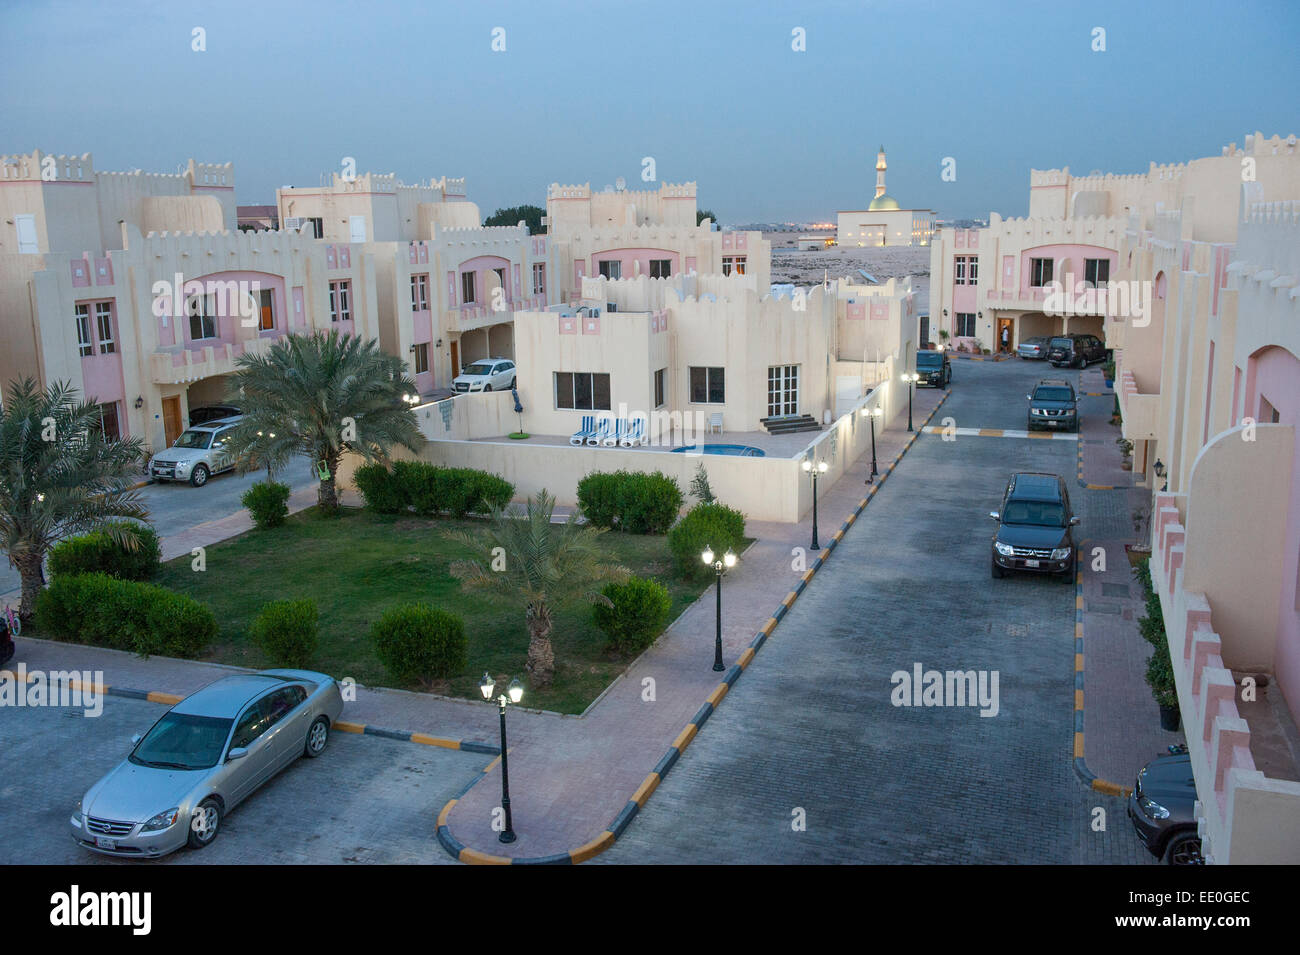 Qatar Housing Stock Photos & Qatar Housing Stock Images - Alamy